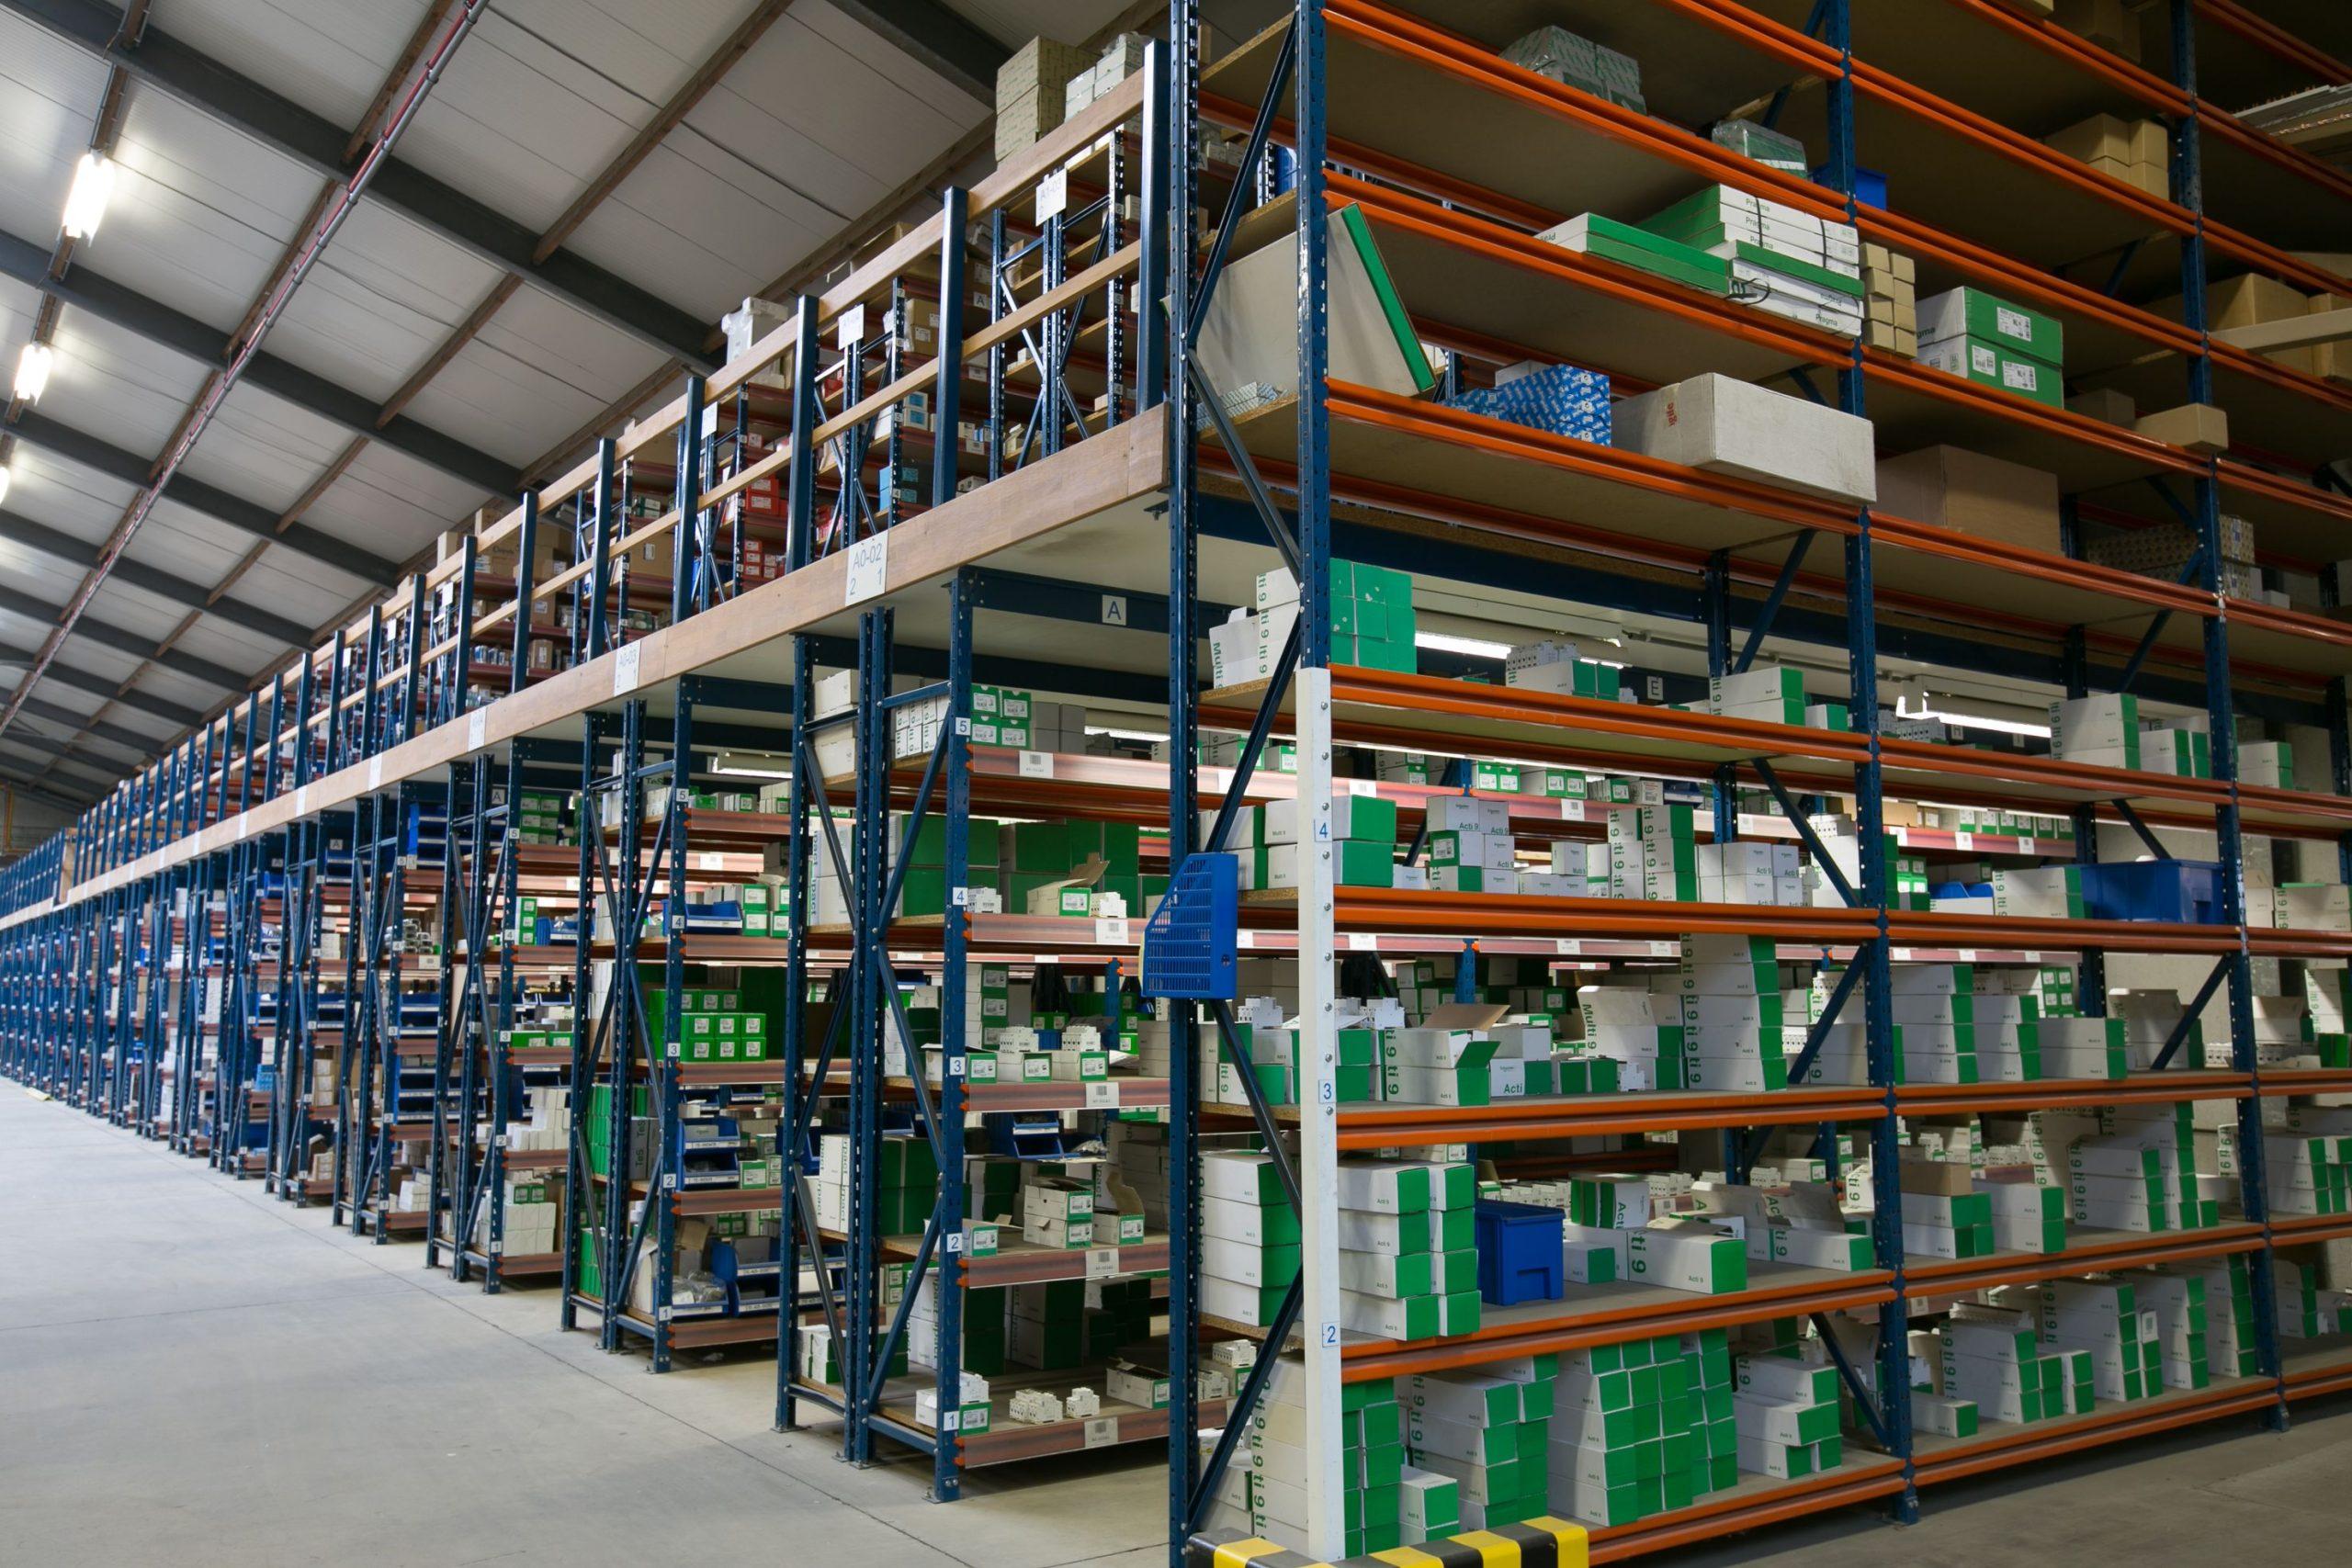 Groothandel regeltechnisch materiaal HVAC